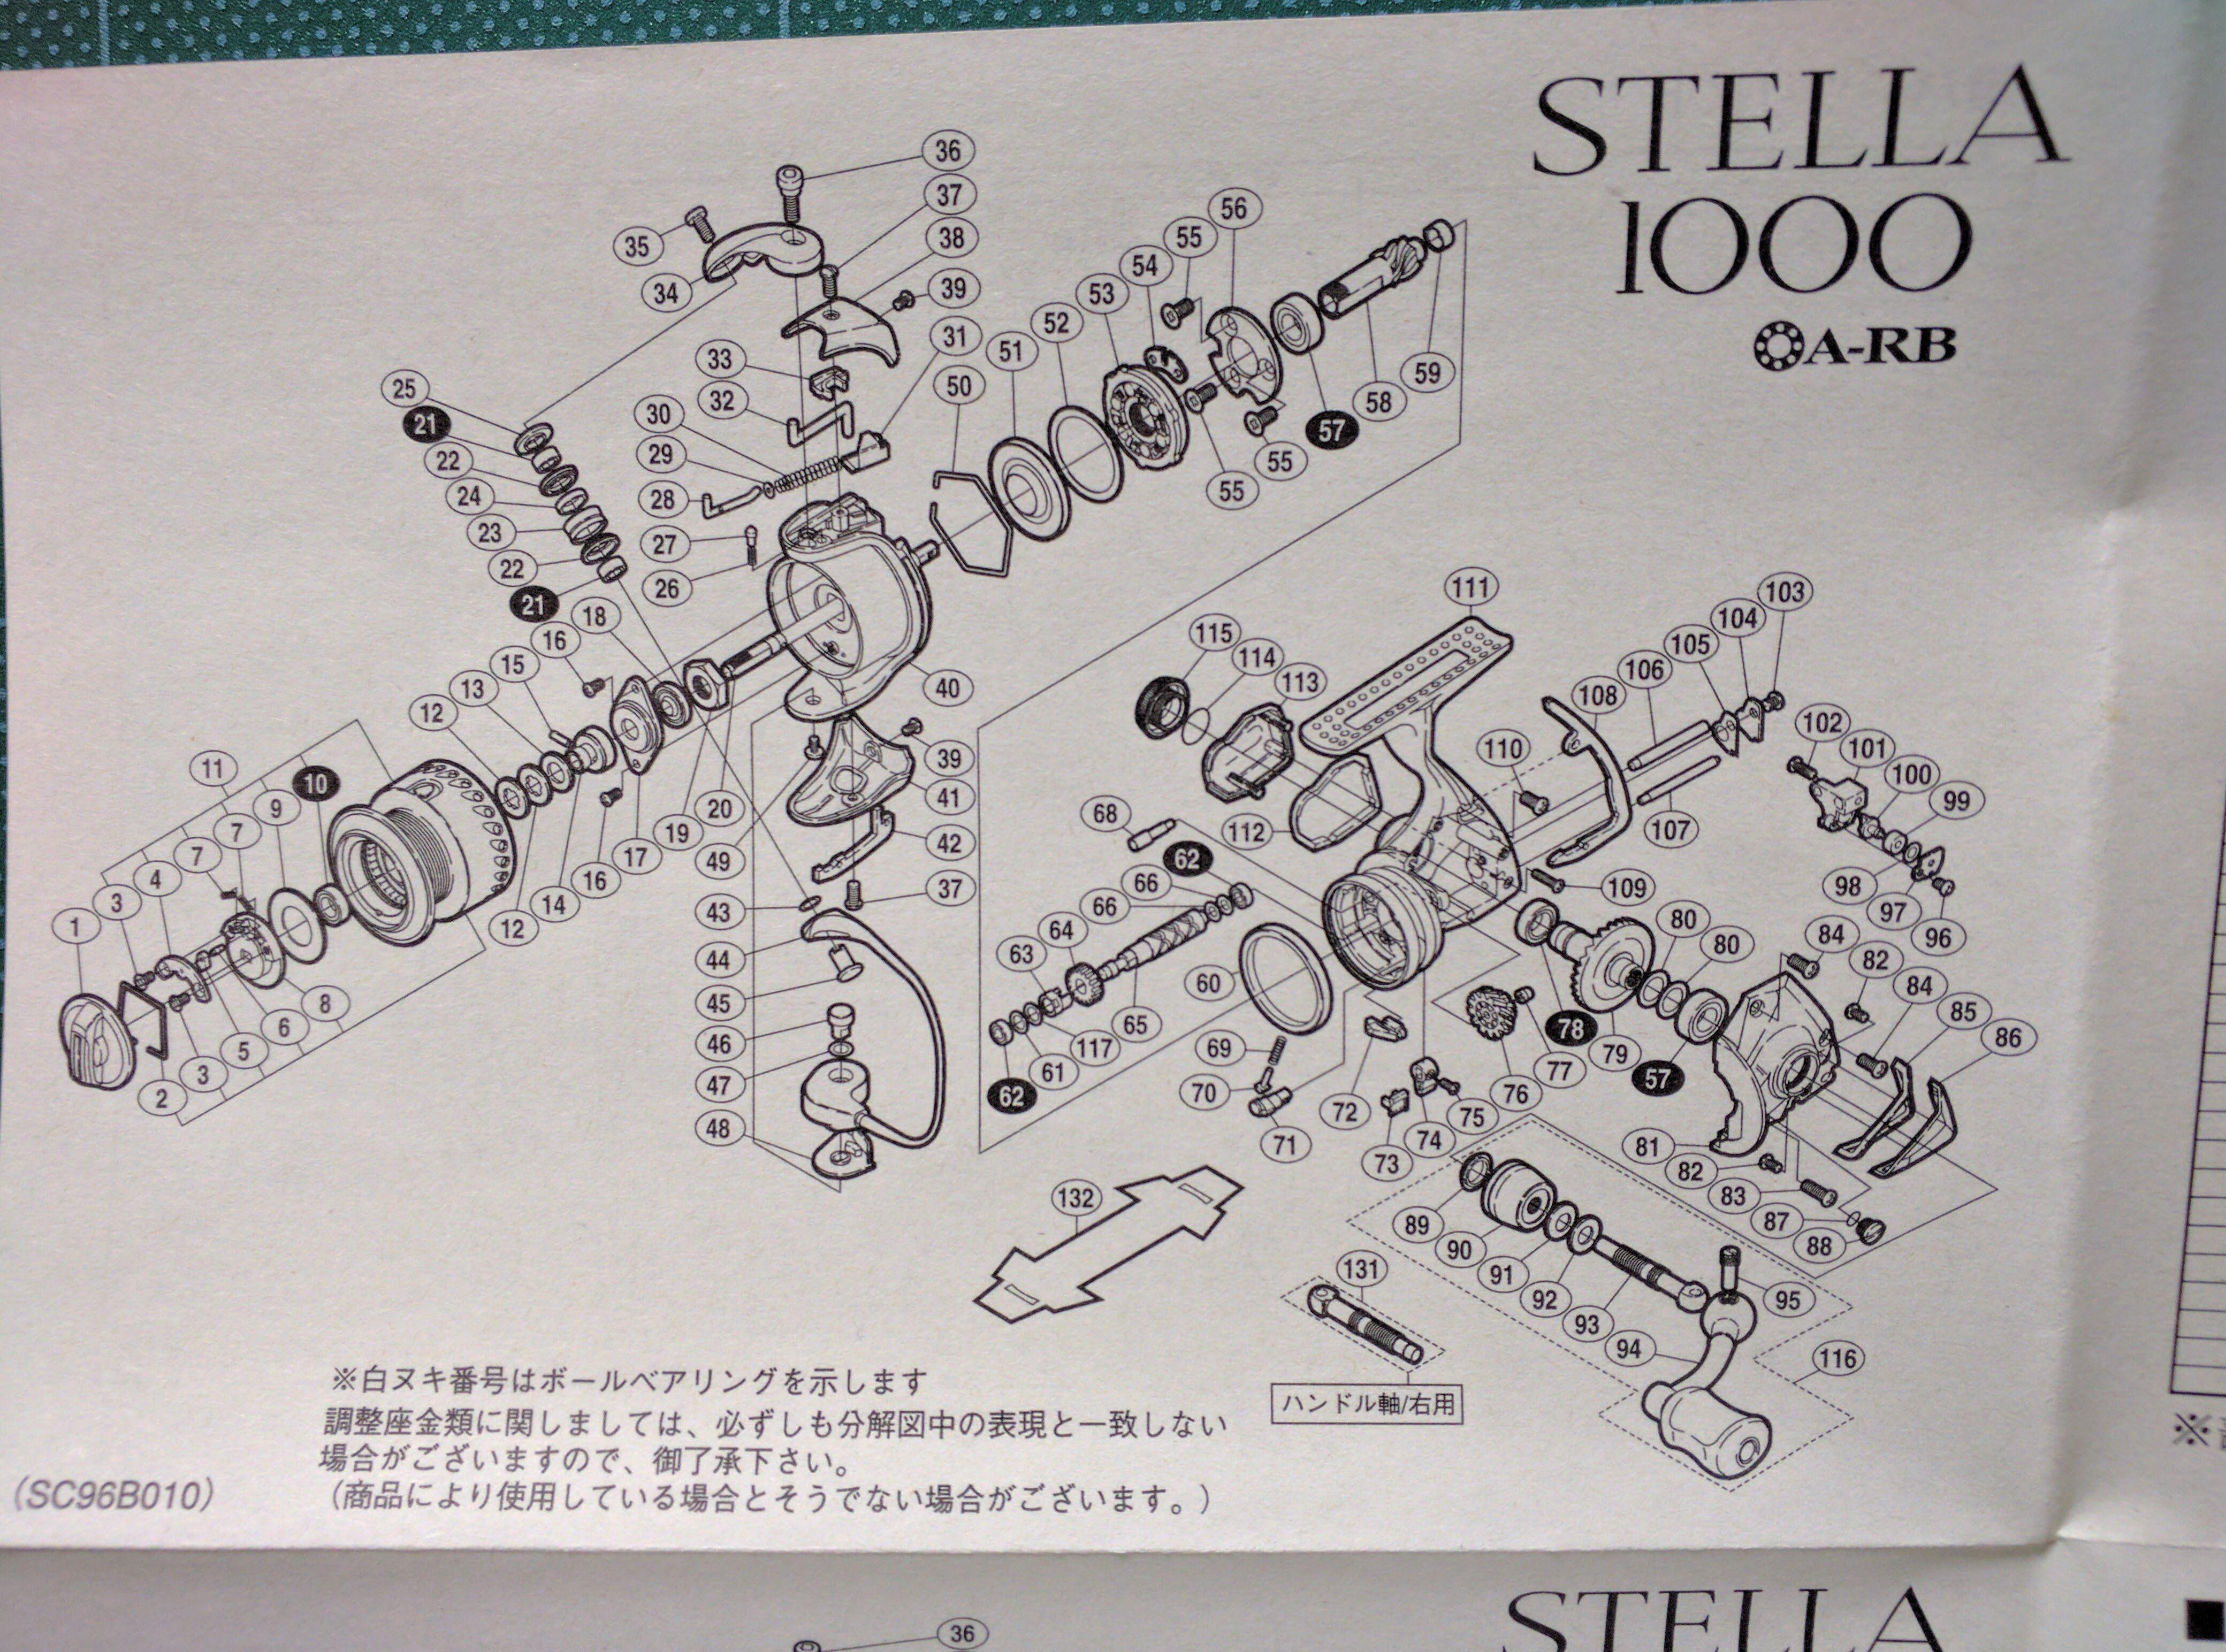 shimano-04stella-1000-schematic (SC96B010)